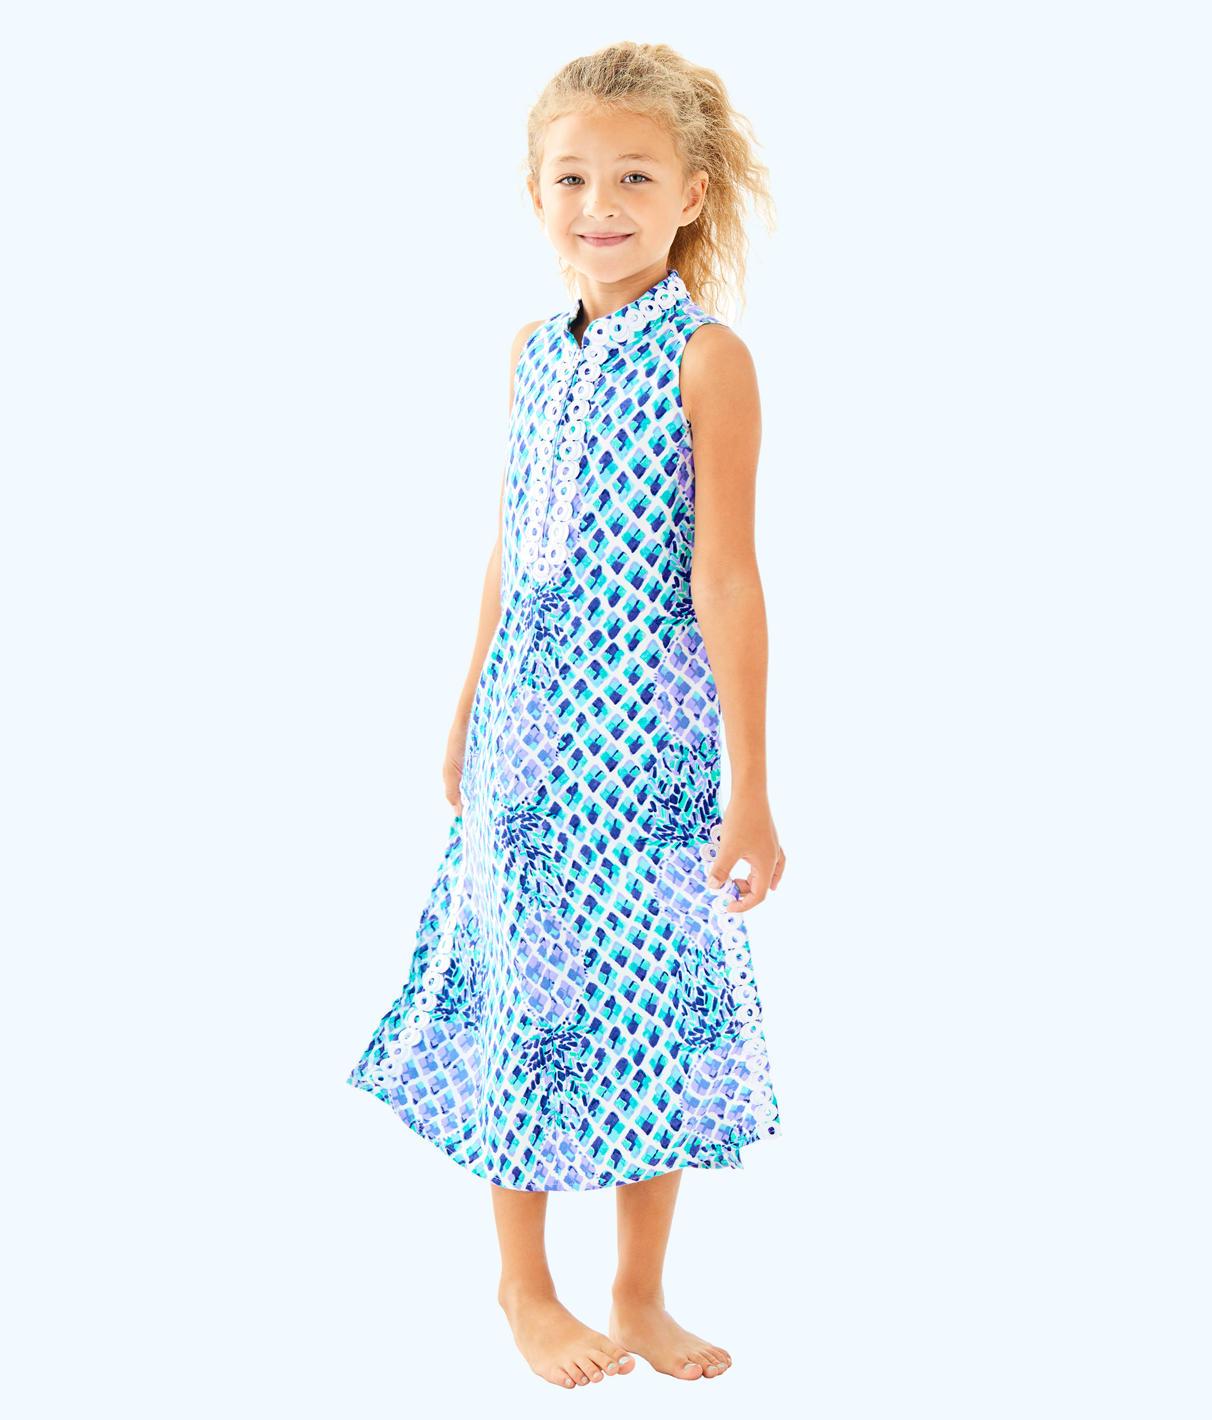 Lilly Pulitzer Lilly Pulitzer Girls Mini Jane Maxi Dress